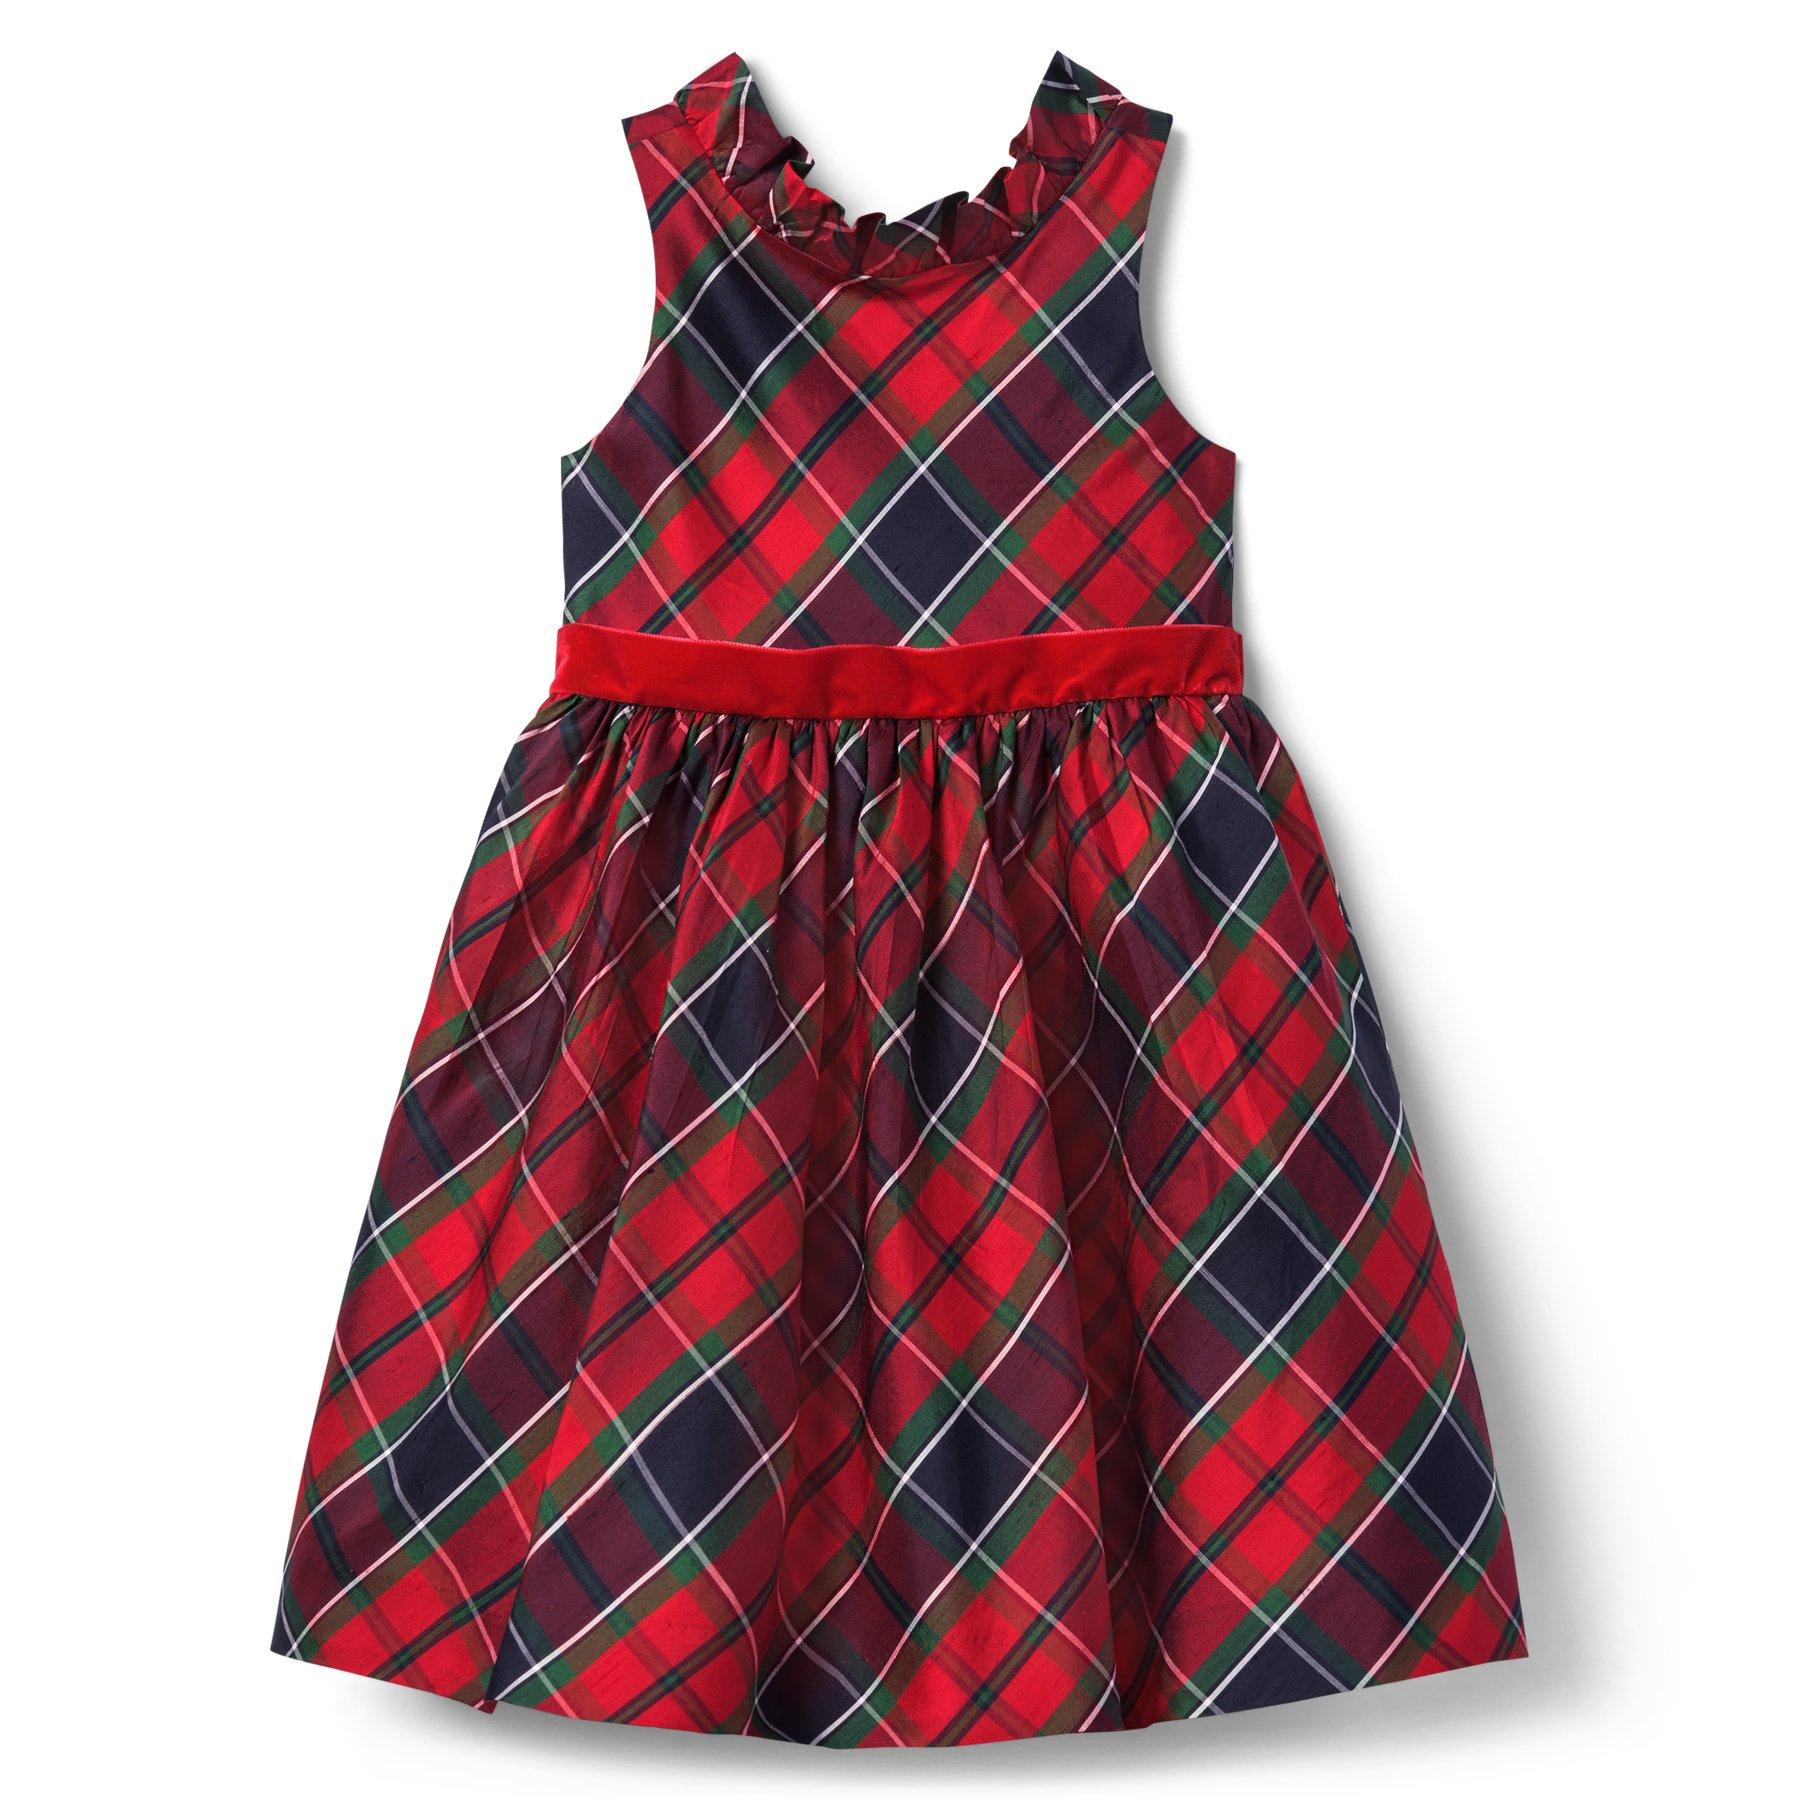 NWT Janie /& Jack PRETTY IN PLAID 3 Lace Print Dress Black Cream Cotton Satin